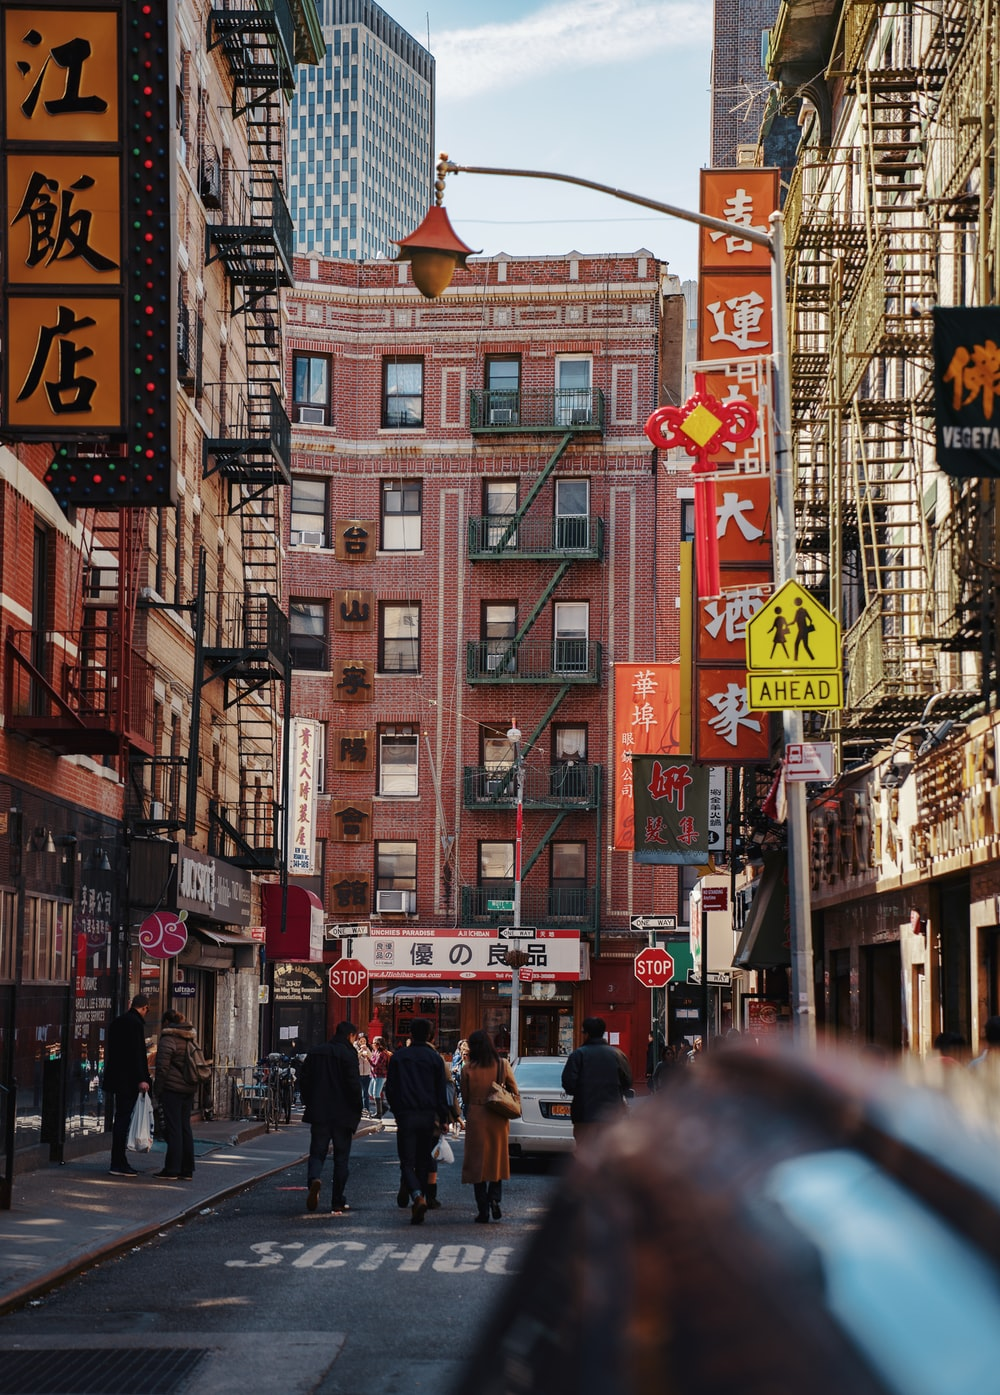 people walks on street during daytime